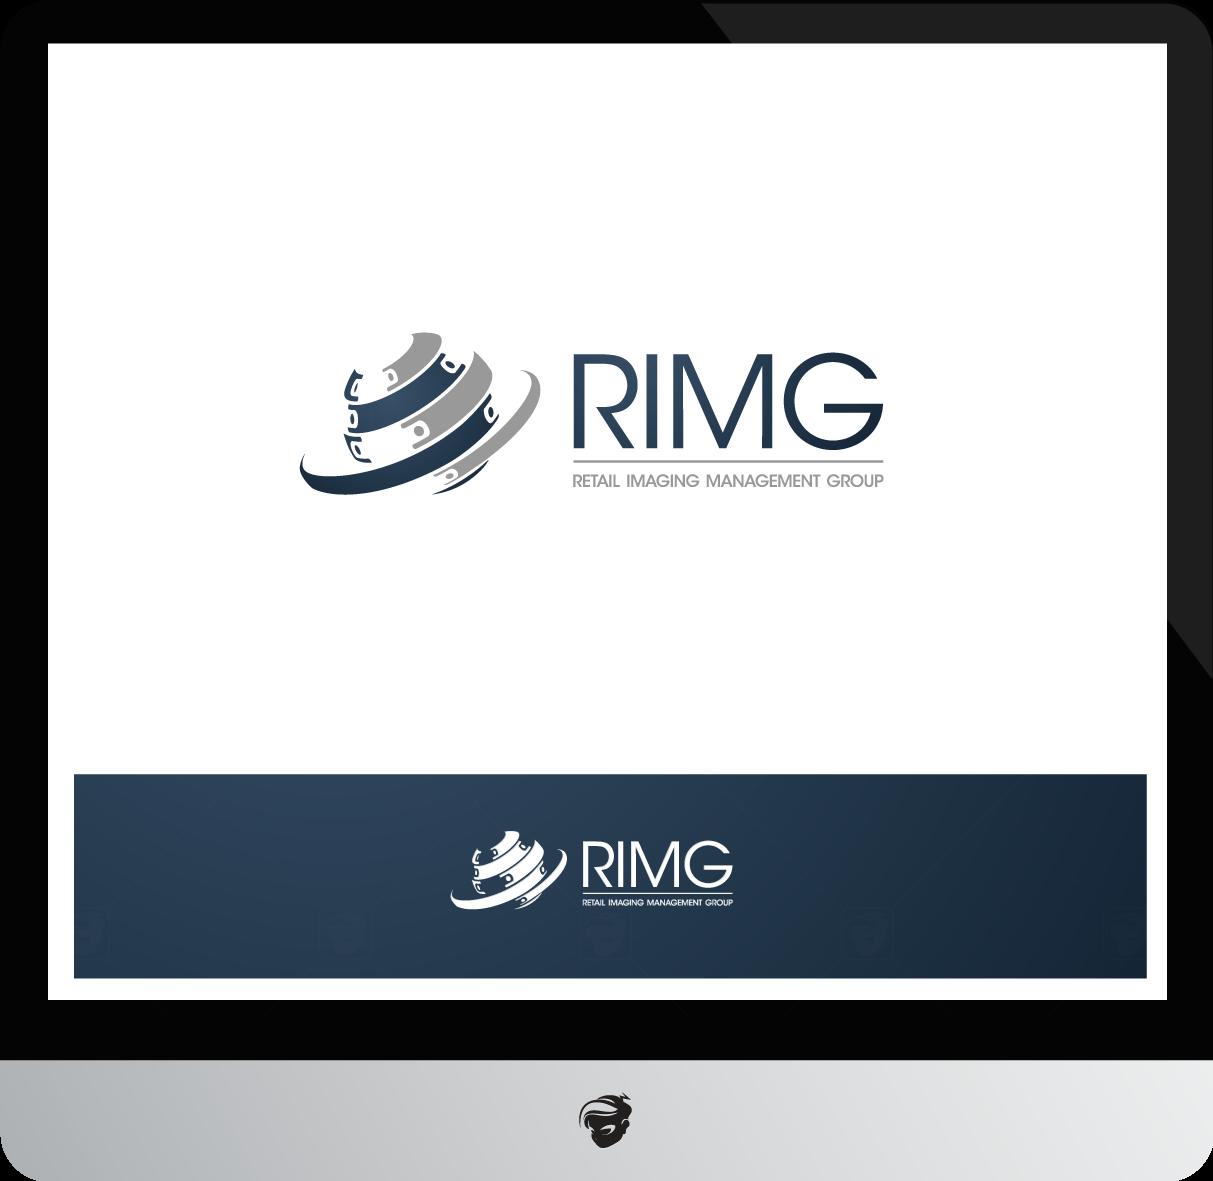 Logo Design by zesthar - Entry No. 106 in the Logo Design Contest Creative Logo Design for Retail Imaging Management Group (R.I.M.G.).